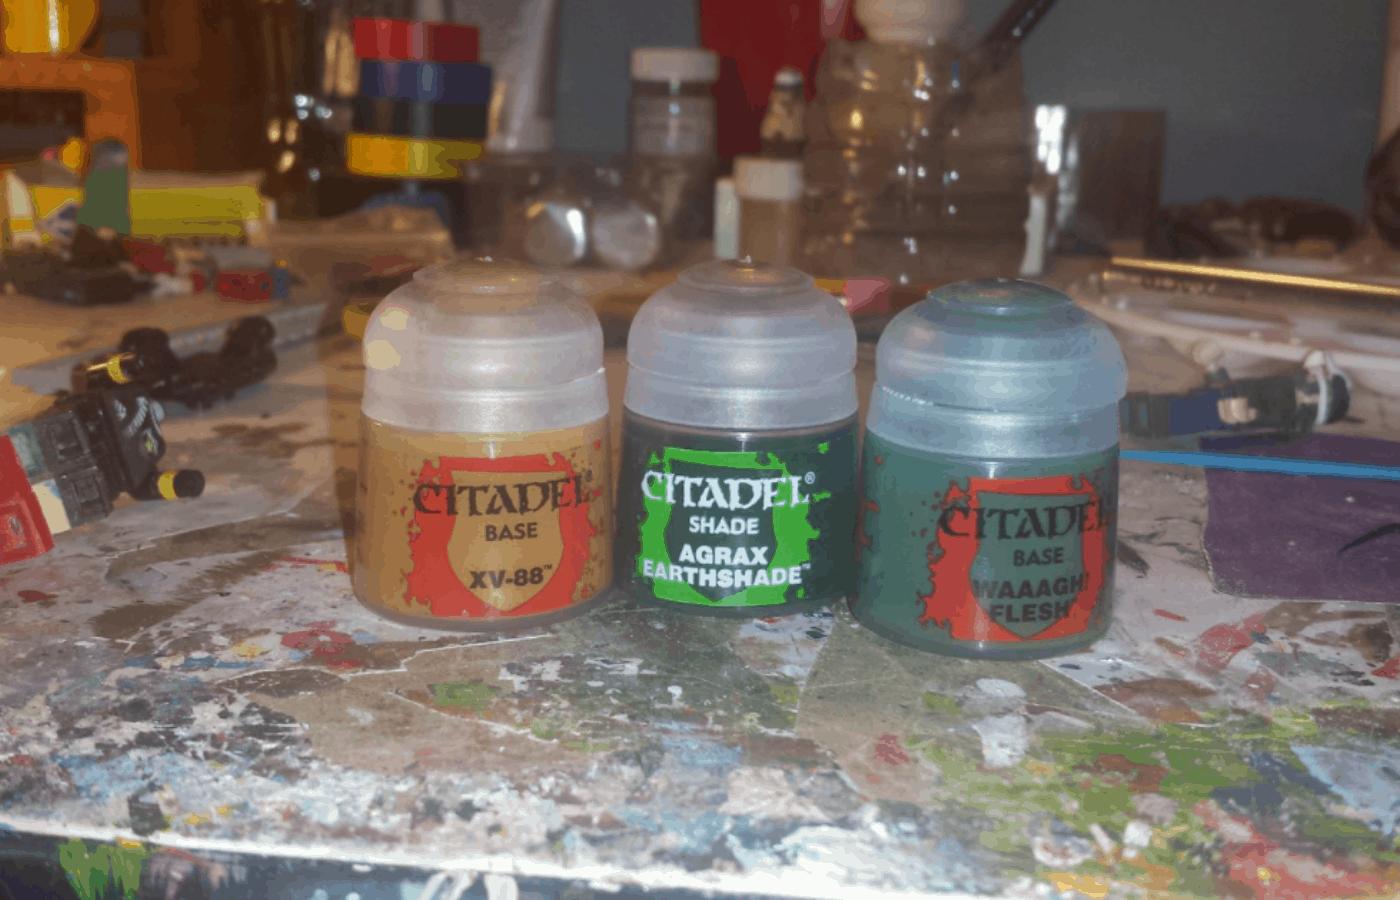 How to OrganizeStore Citadel Paints